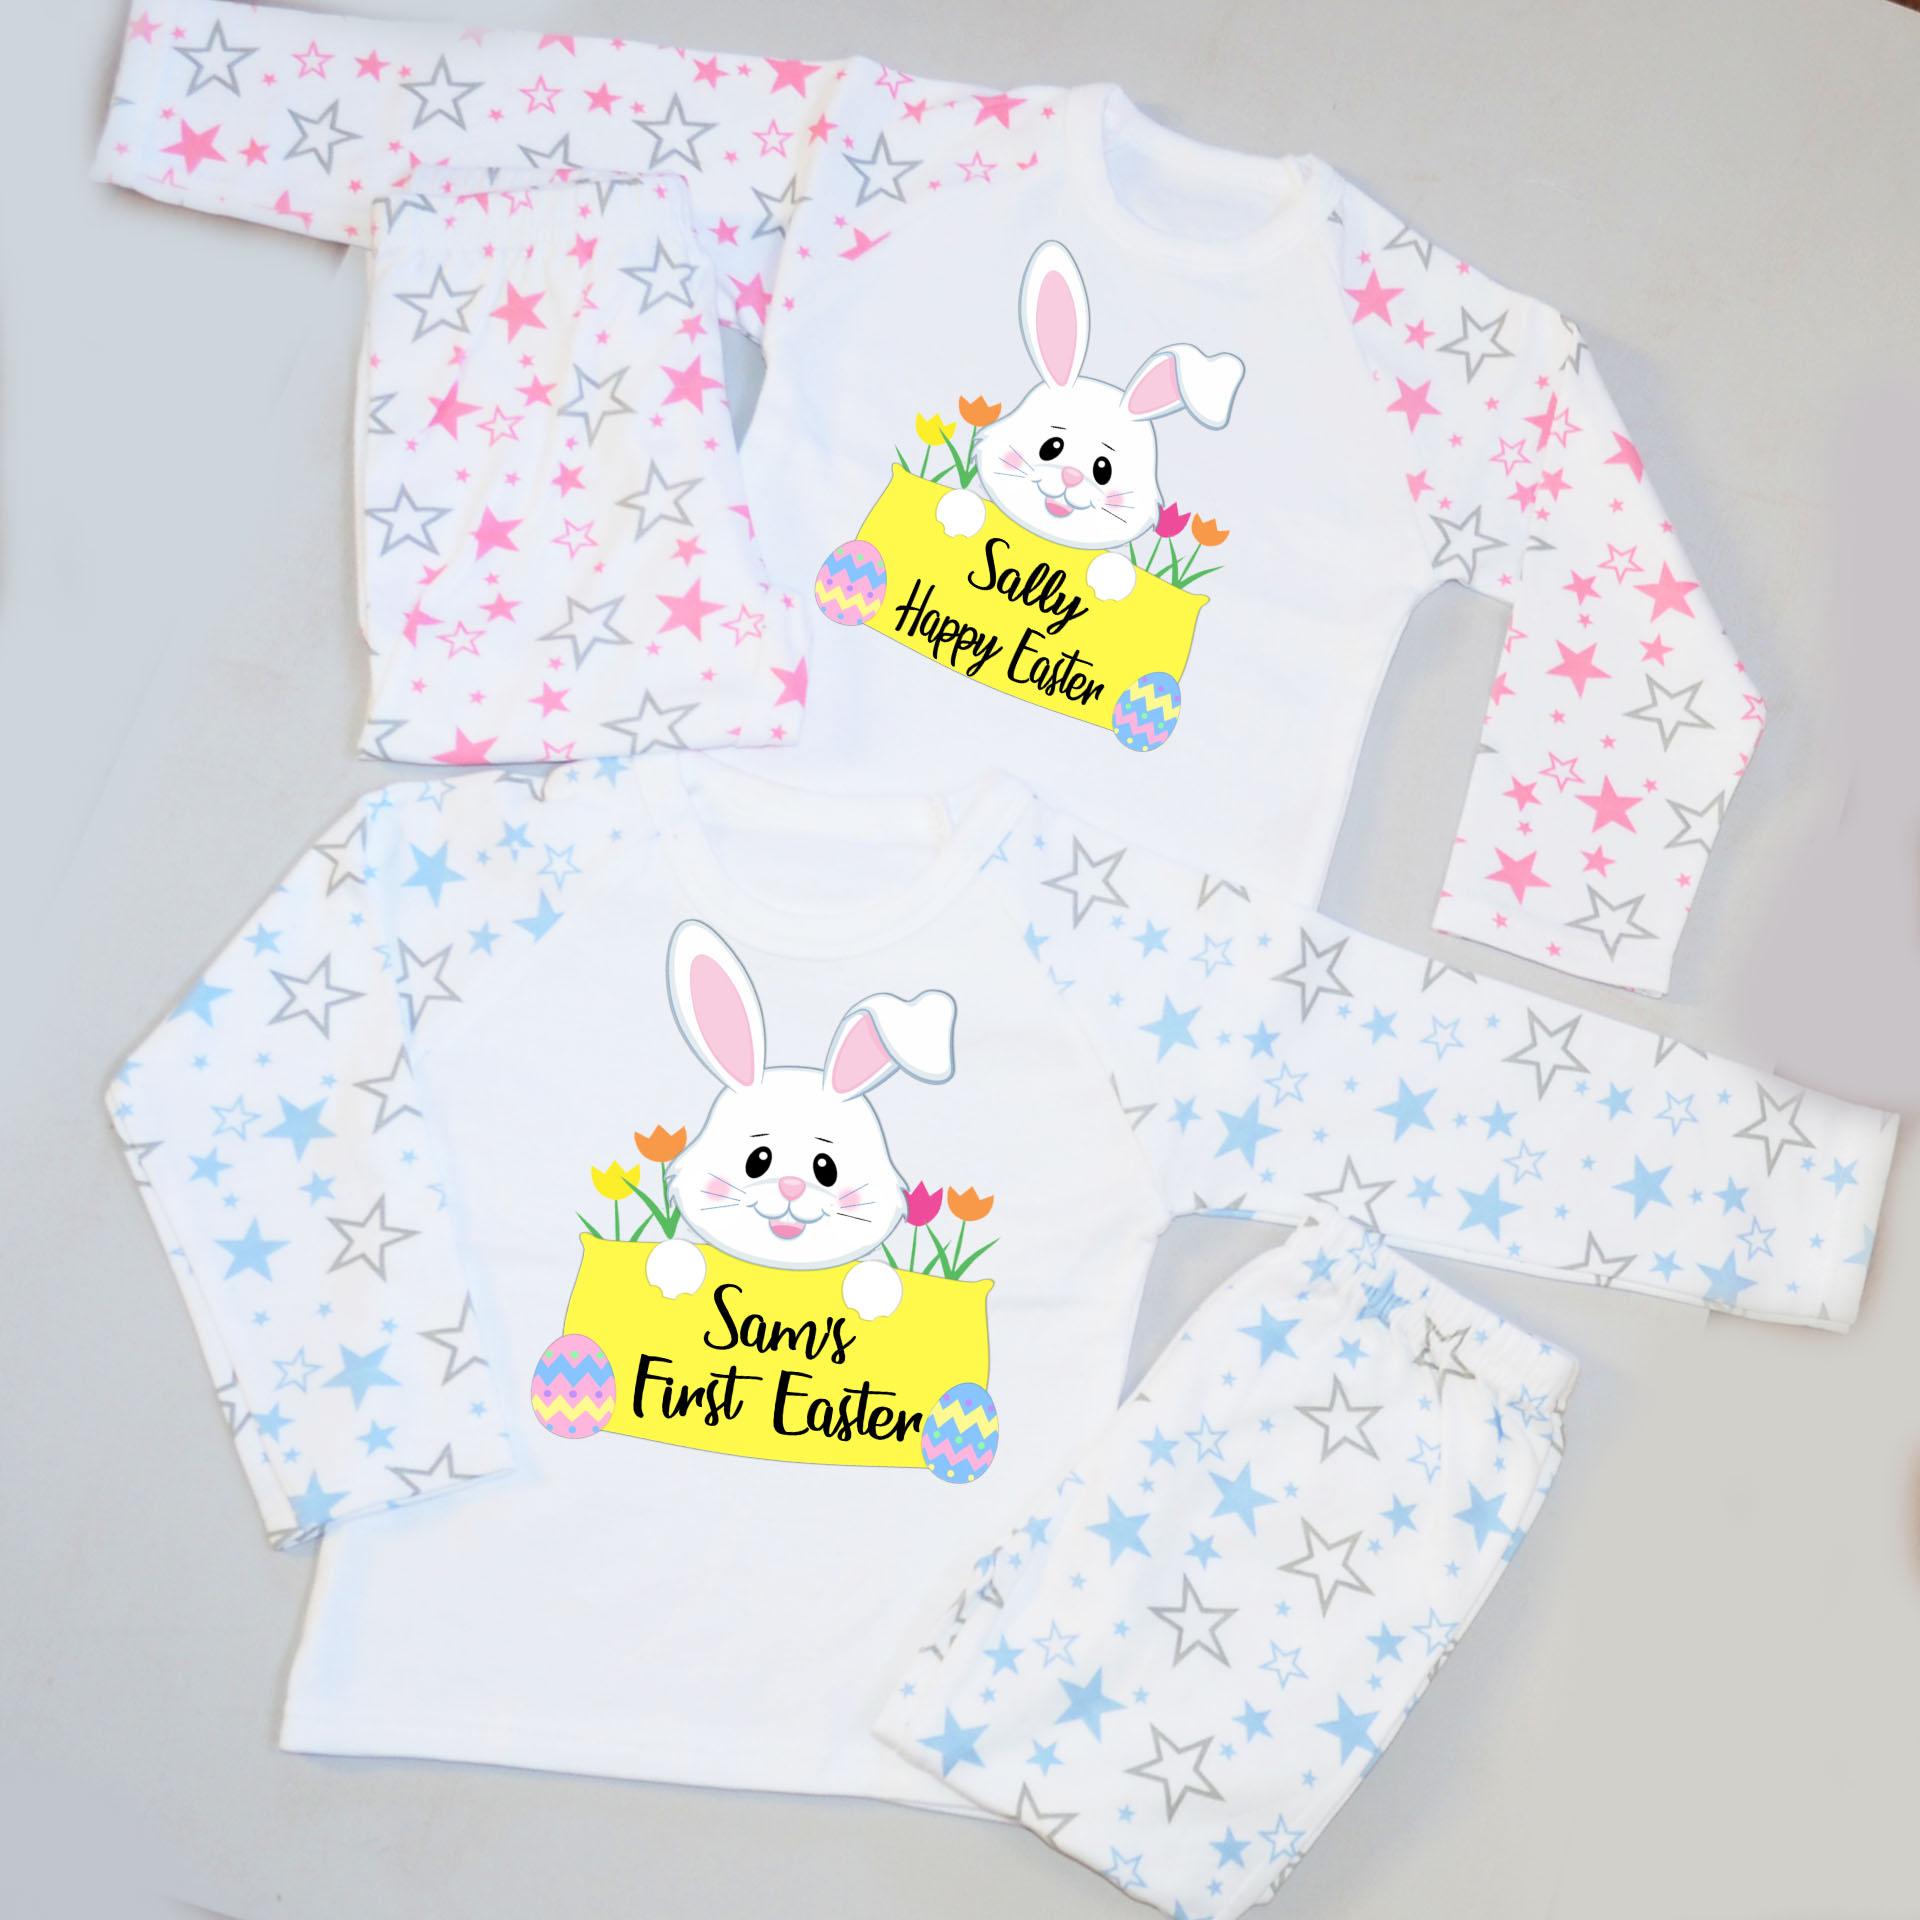 Hut Pj: Personalised Kids Pyjamas-Easter Bunny Holding A Banner